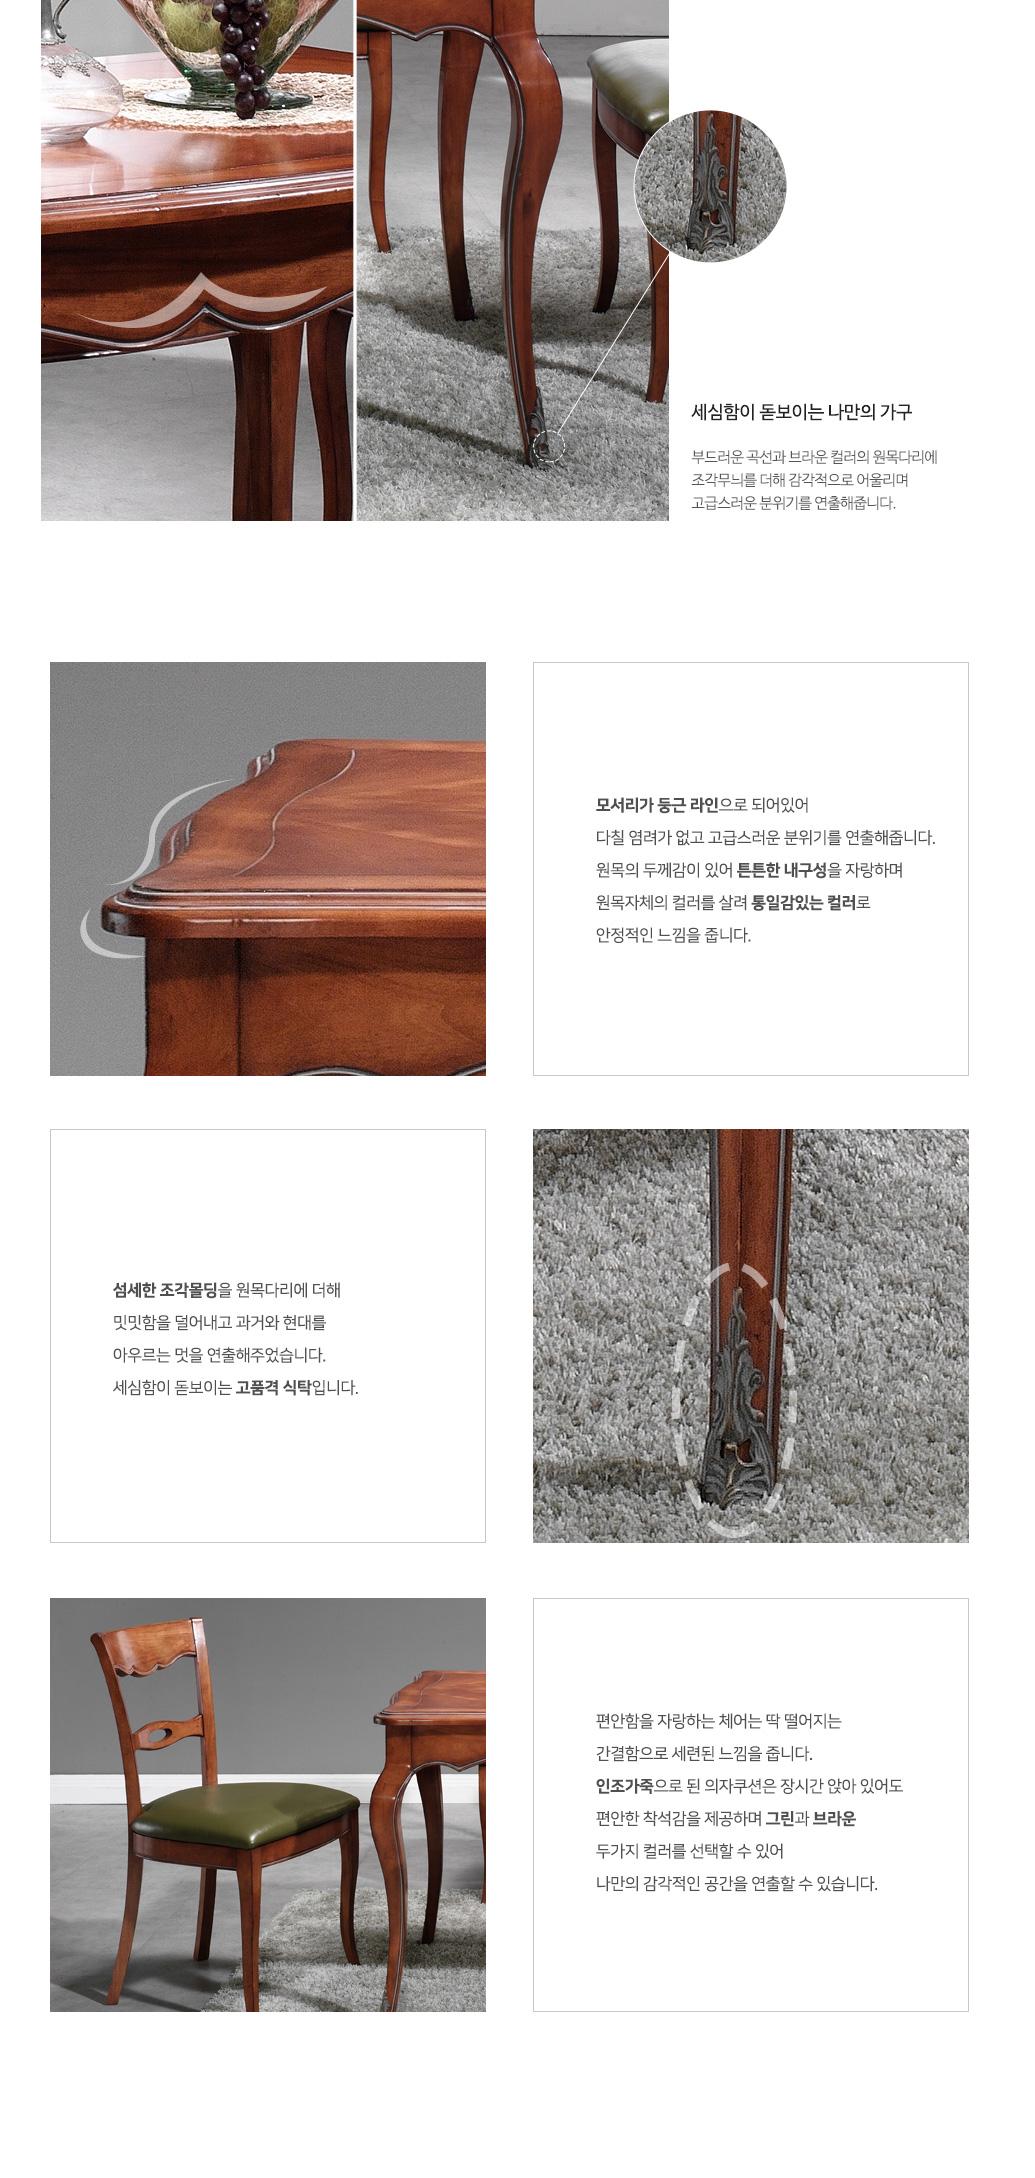 chocolat-table_05.jpg